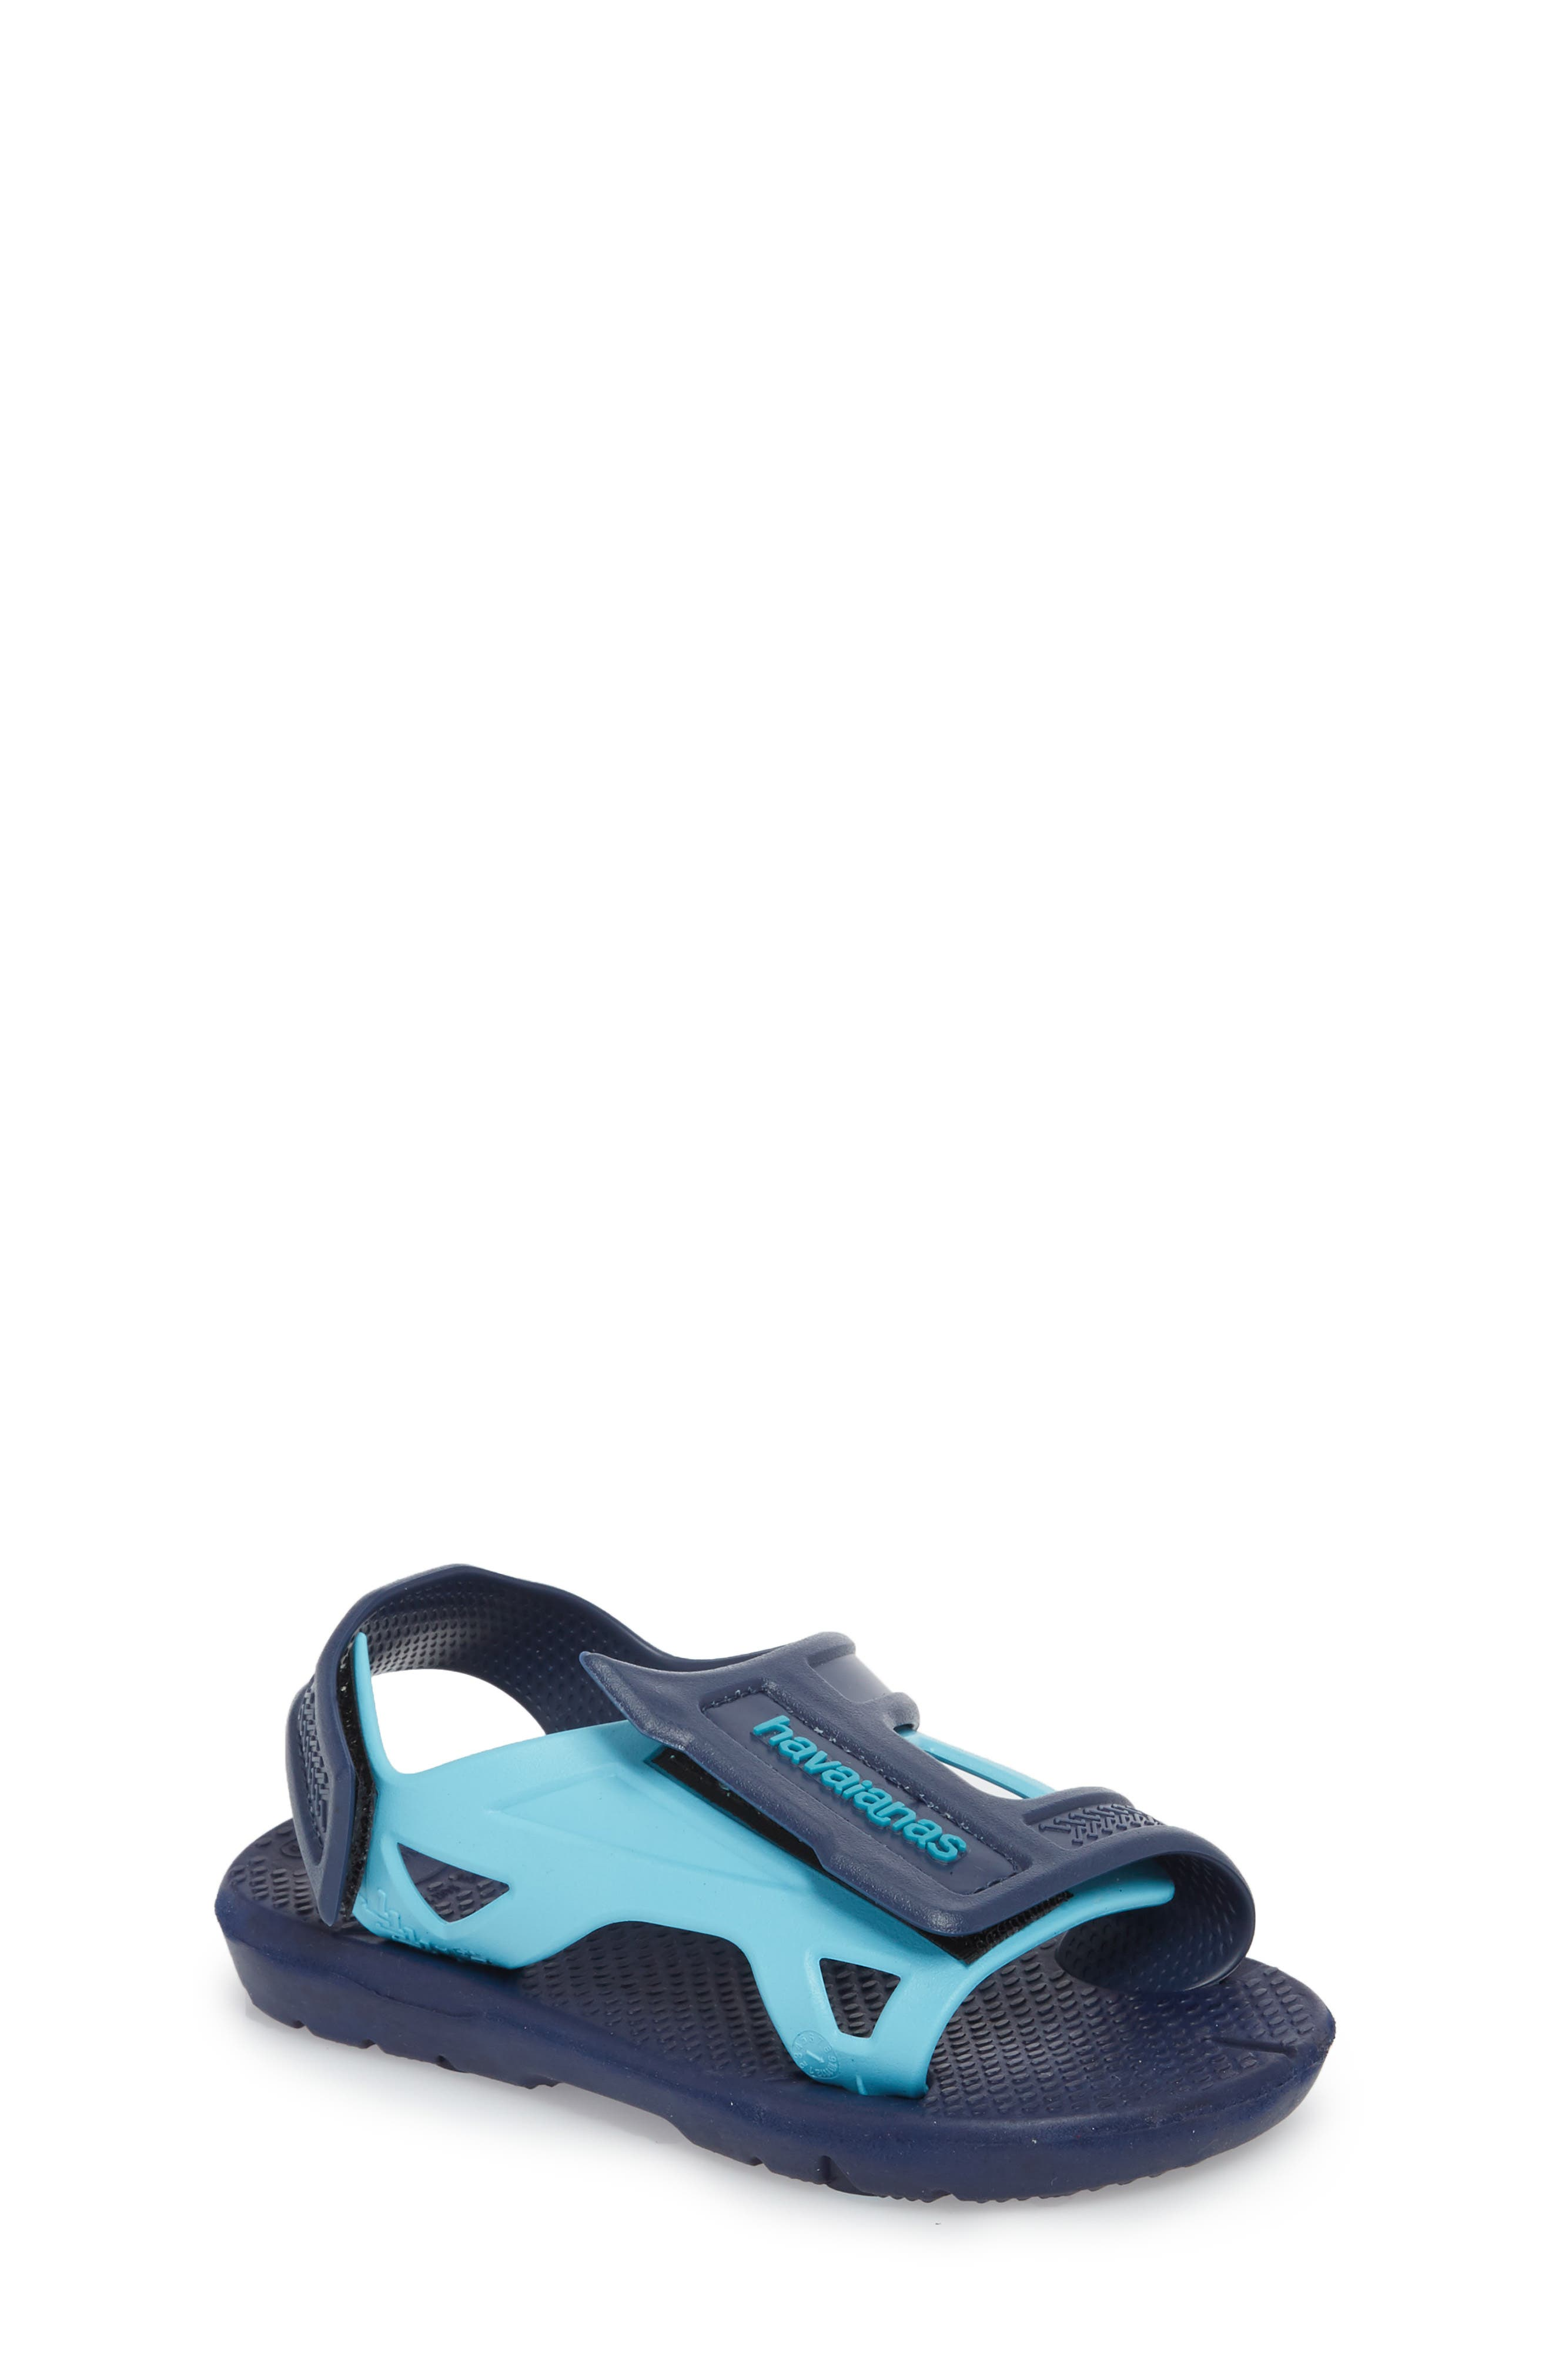 Move Sandal,                         Main,                         color, Navy Blue